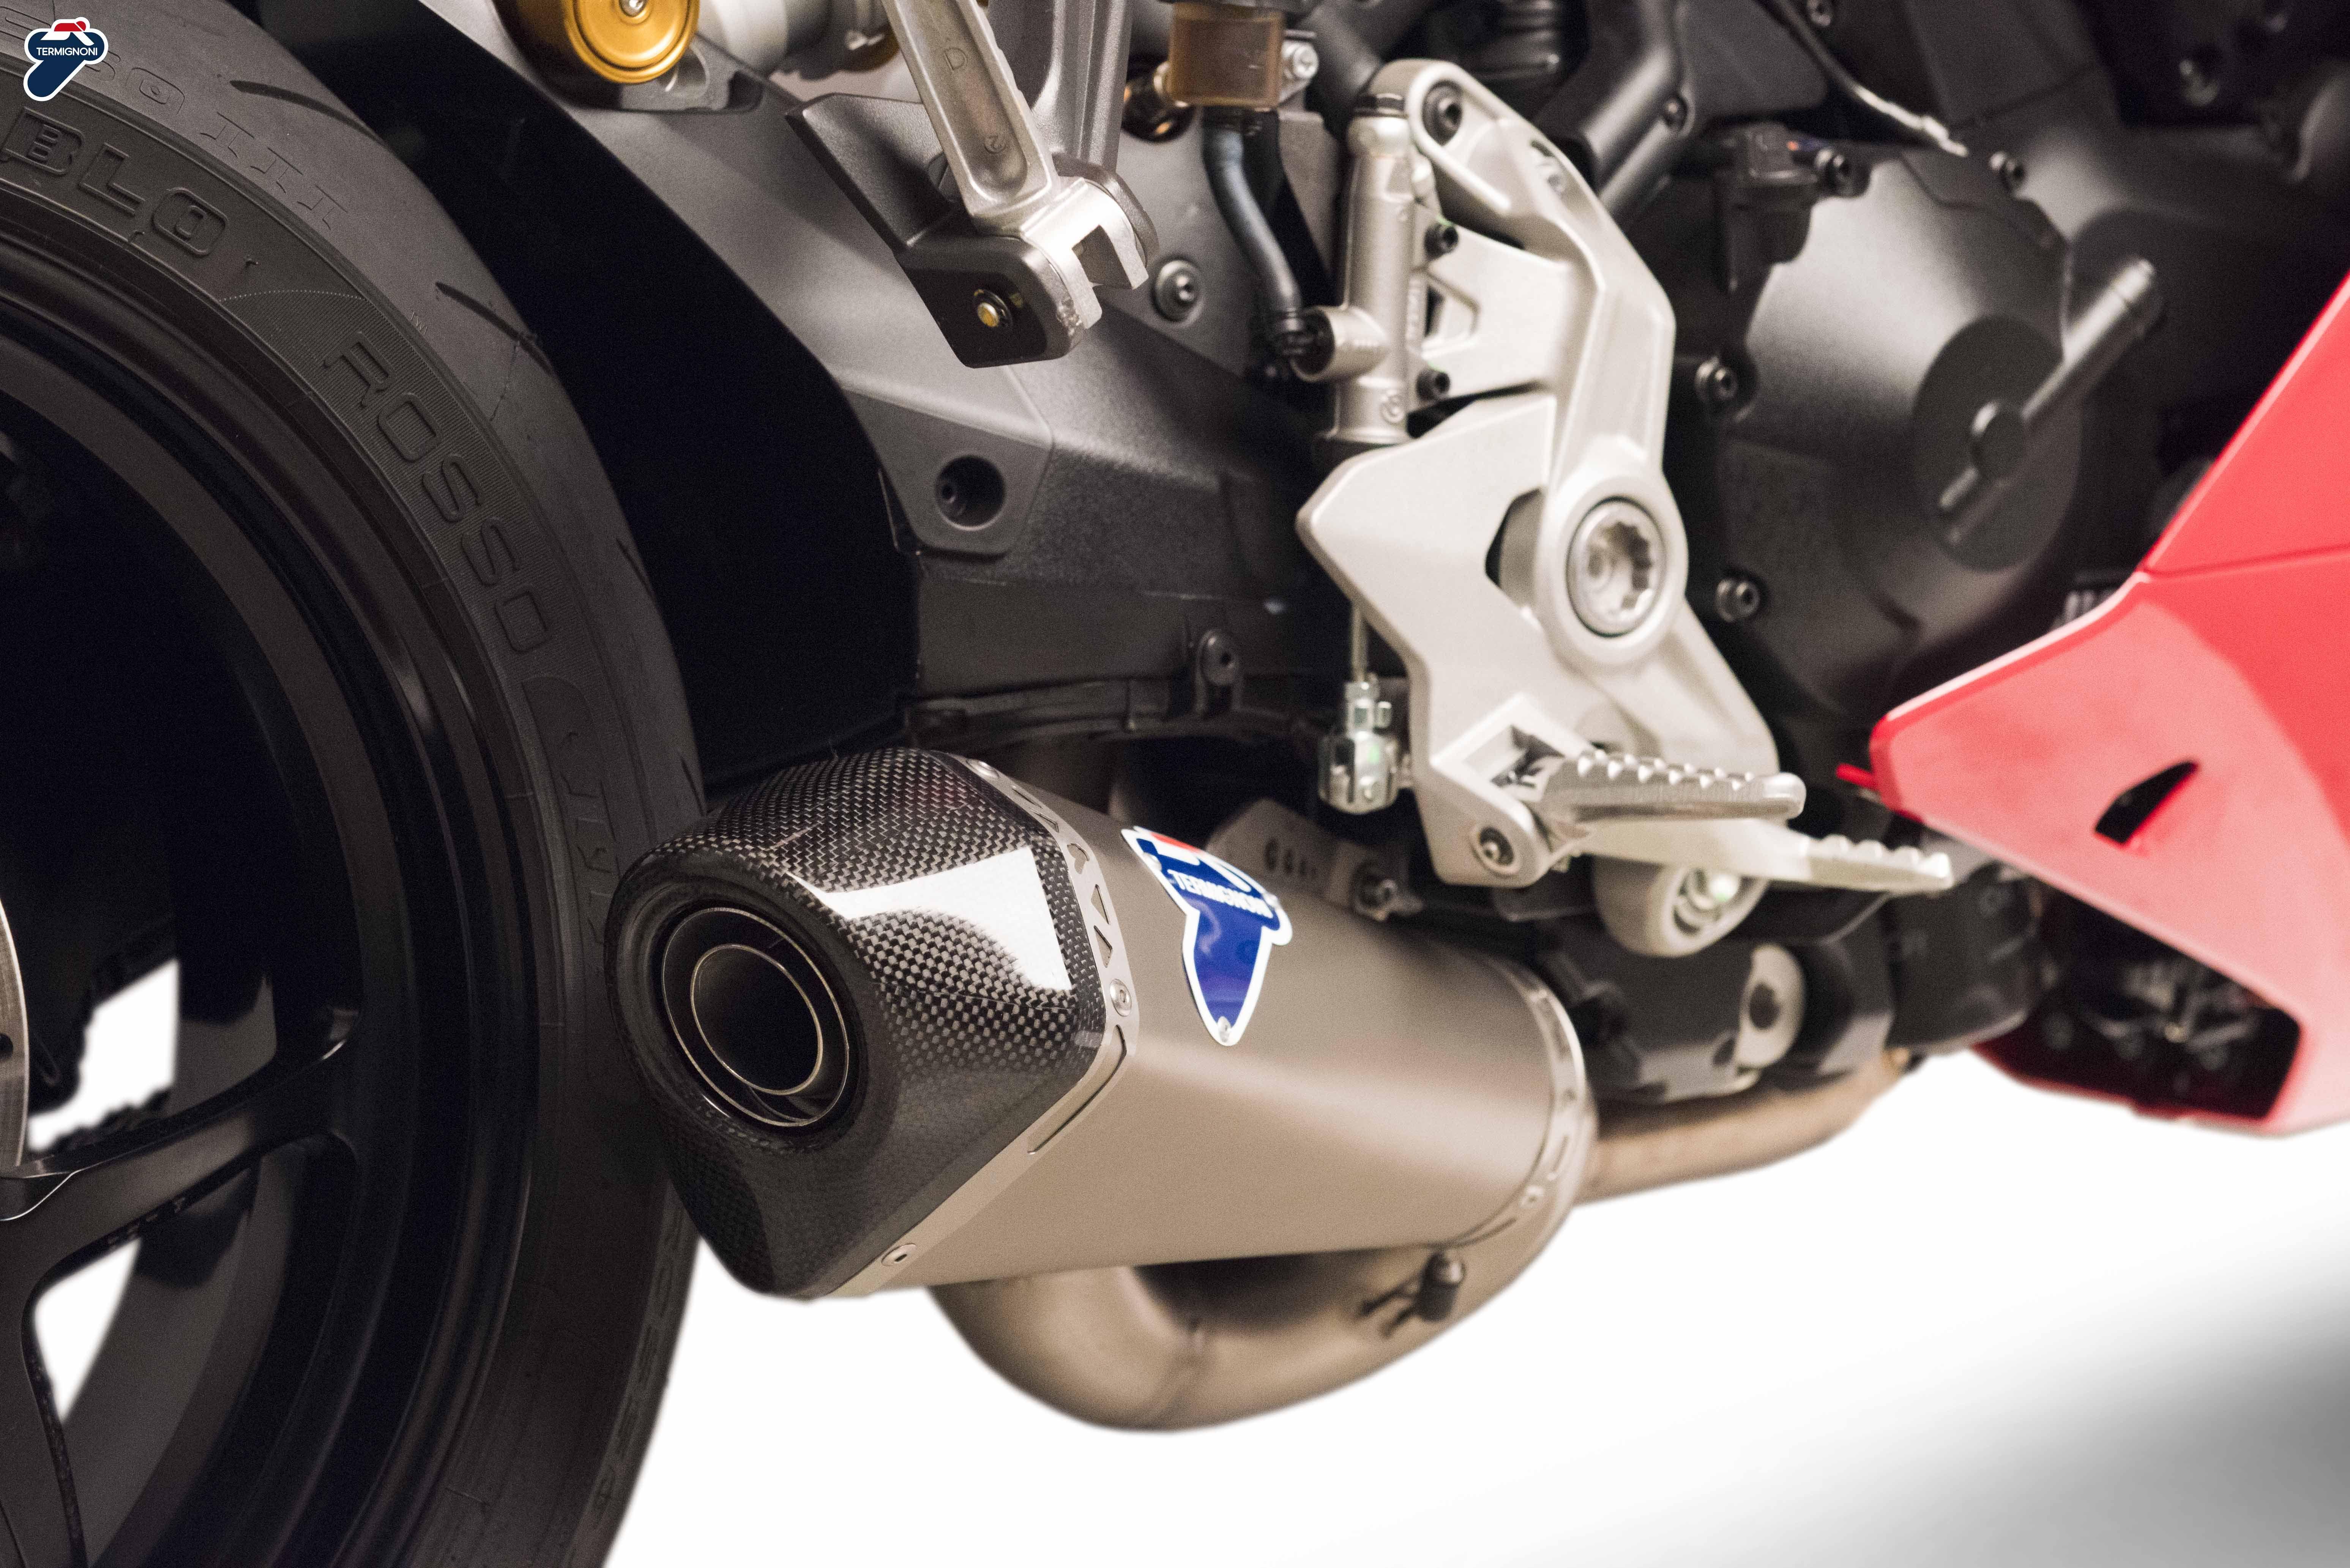 Termignoni D181 Racing Silencer With De Cat Ducati Supersport S Ducati Supersport Supersport Ducati